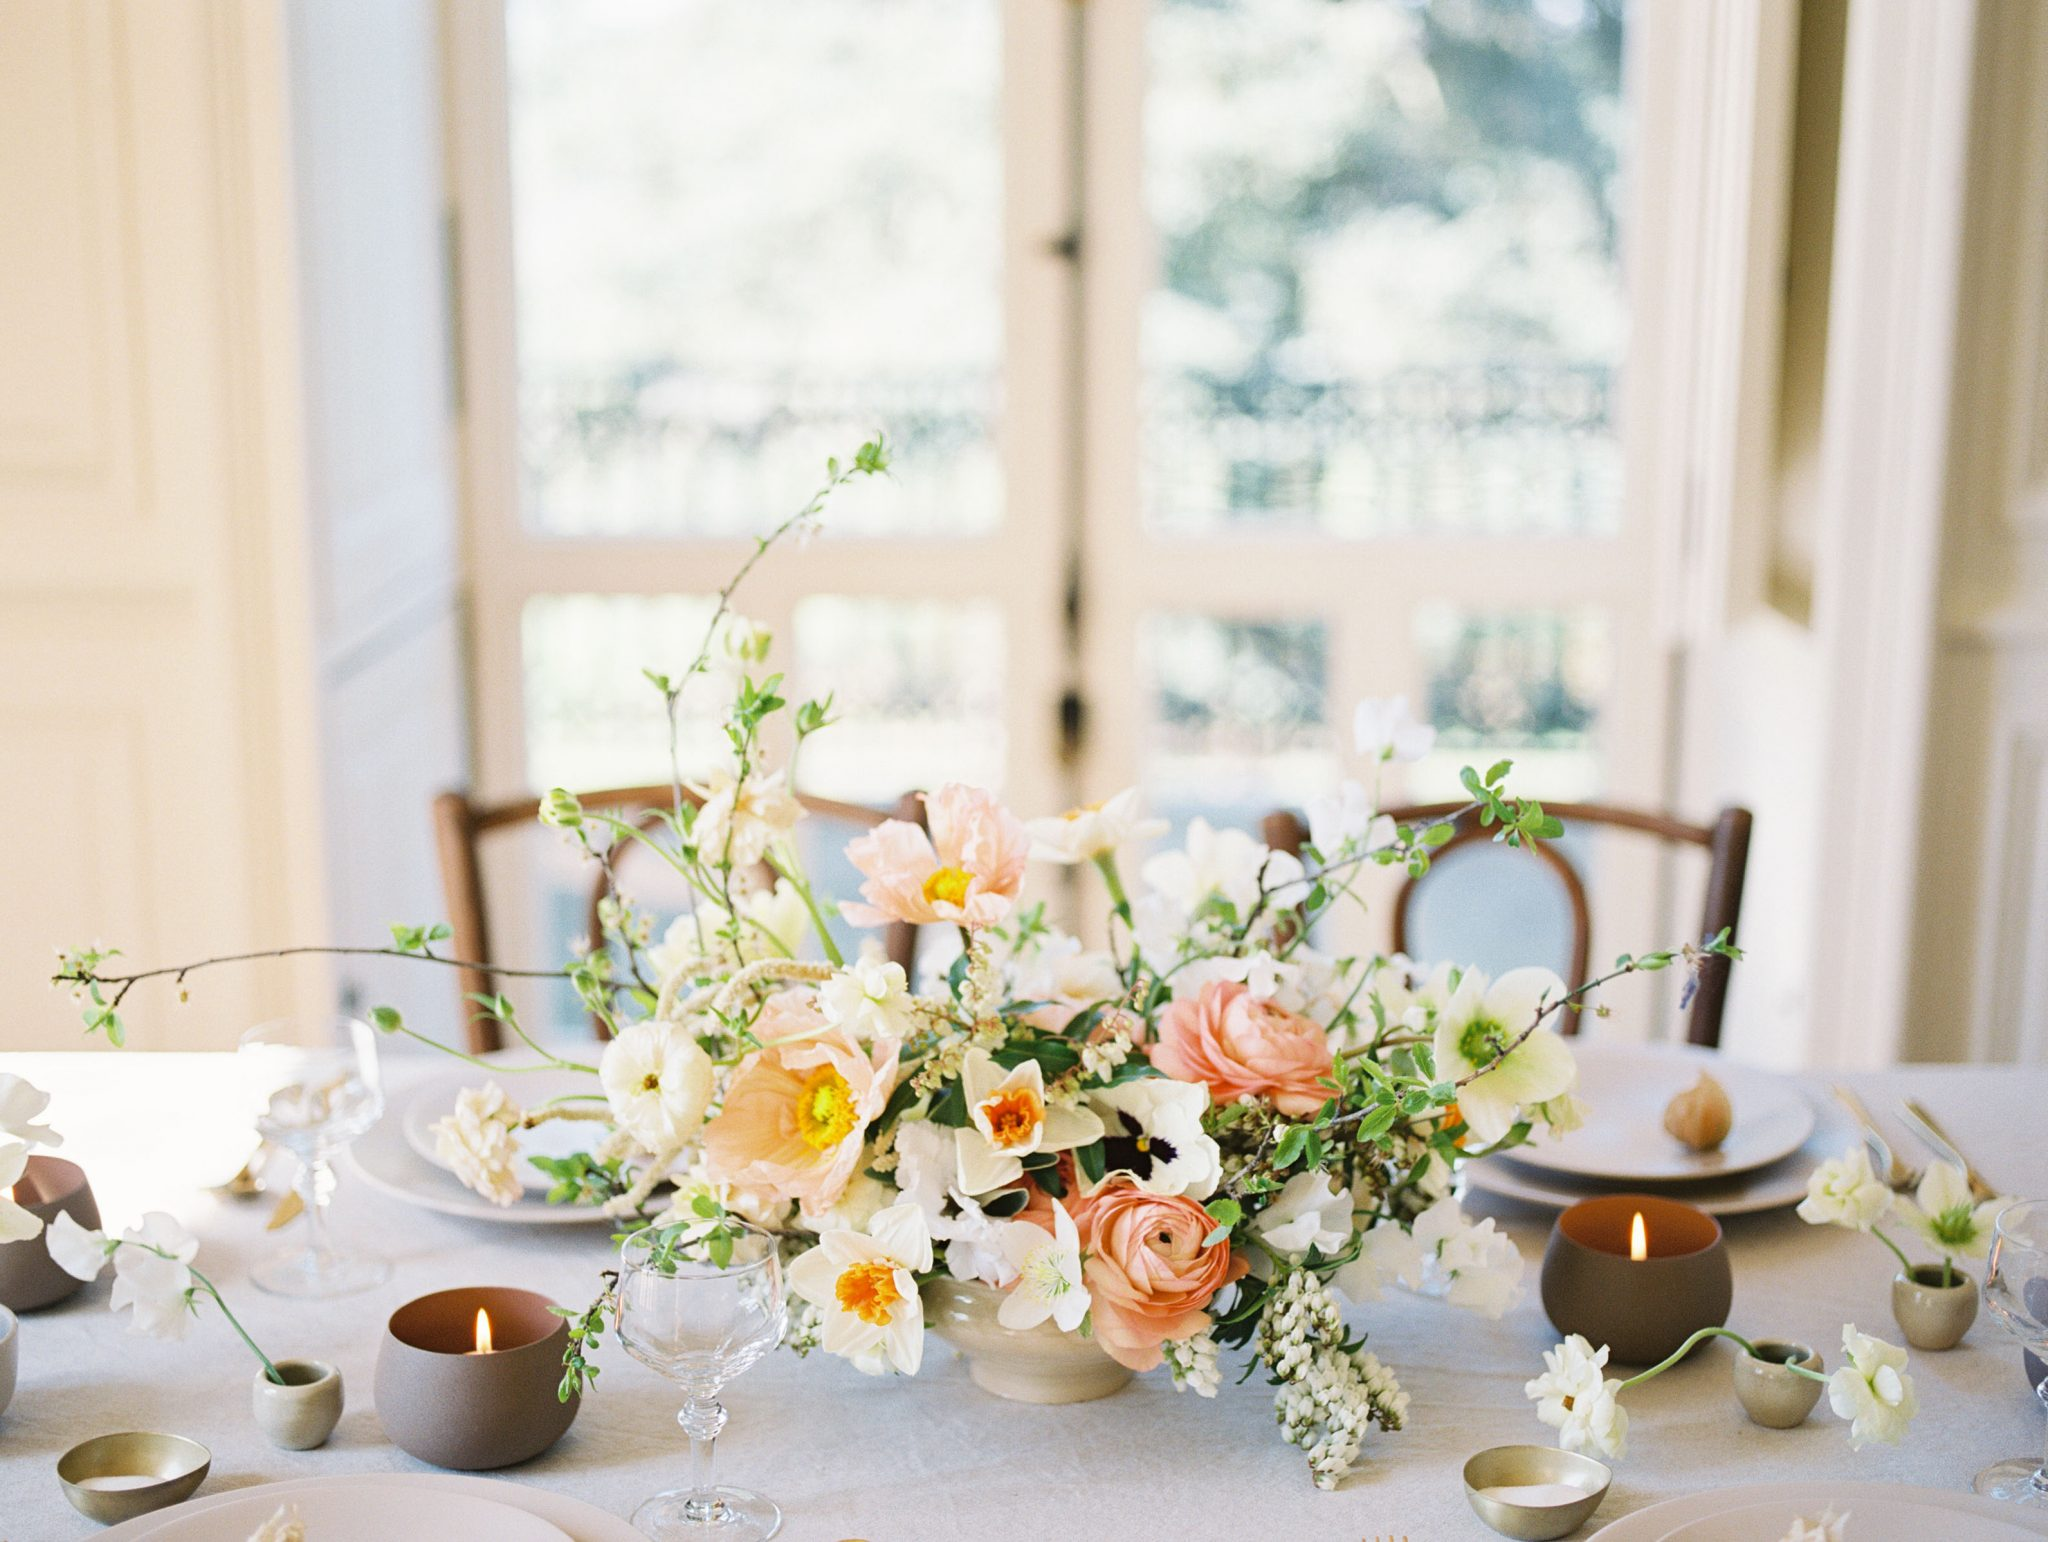 JaunePivoine-fleuristemariage-lyon36